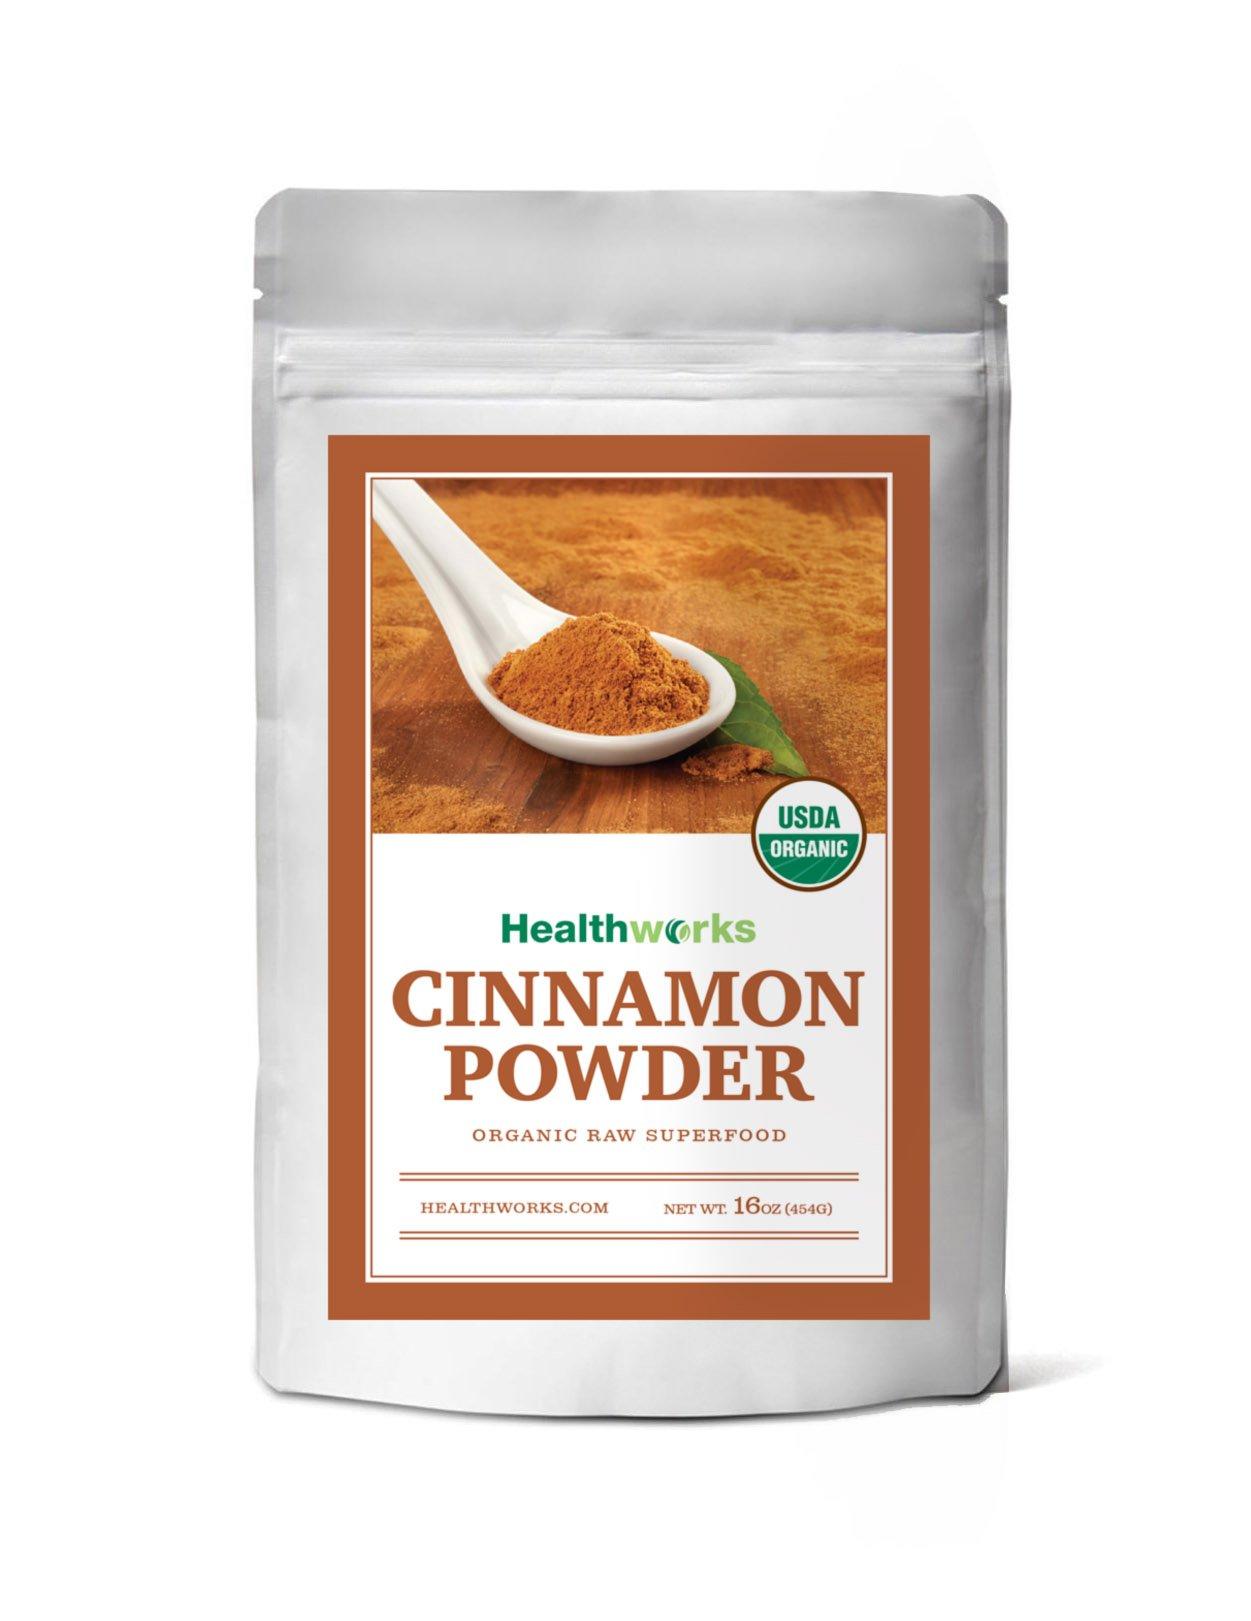 Healthworks Ceylon Cinnamon Organic Ground Powder 1Lb 10